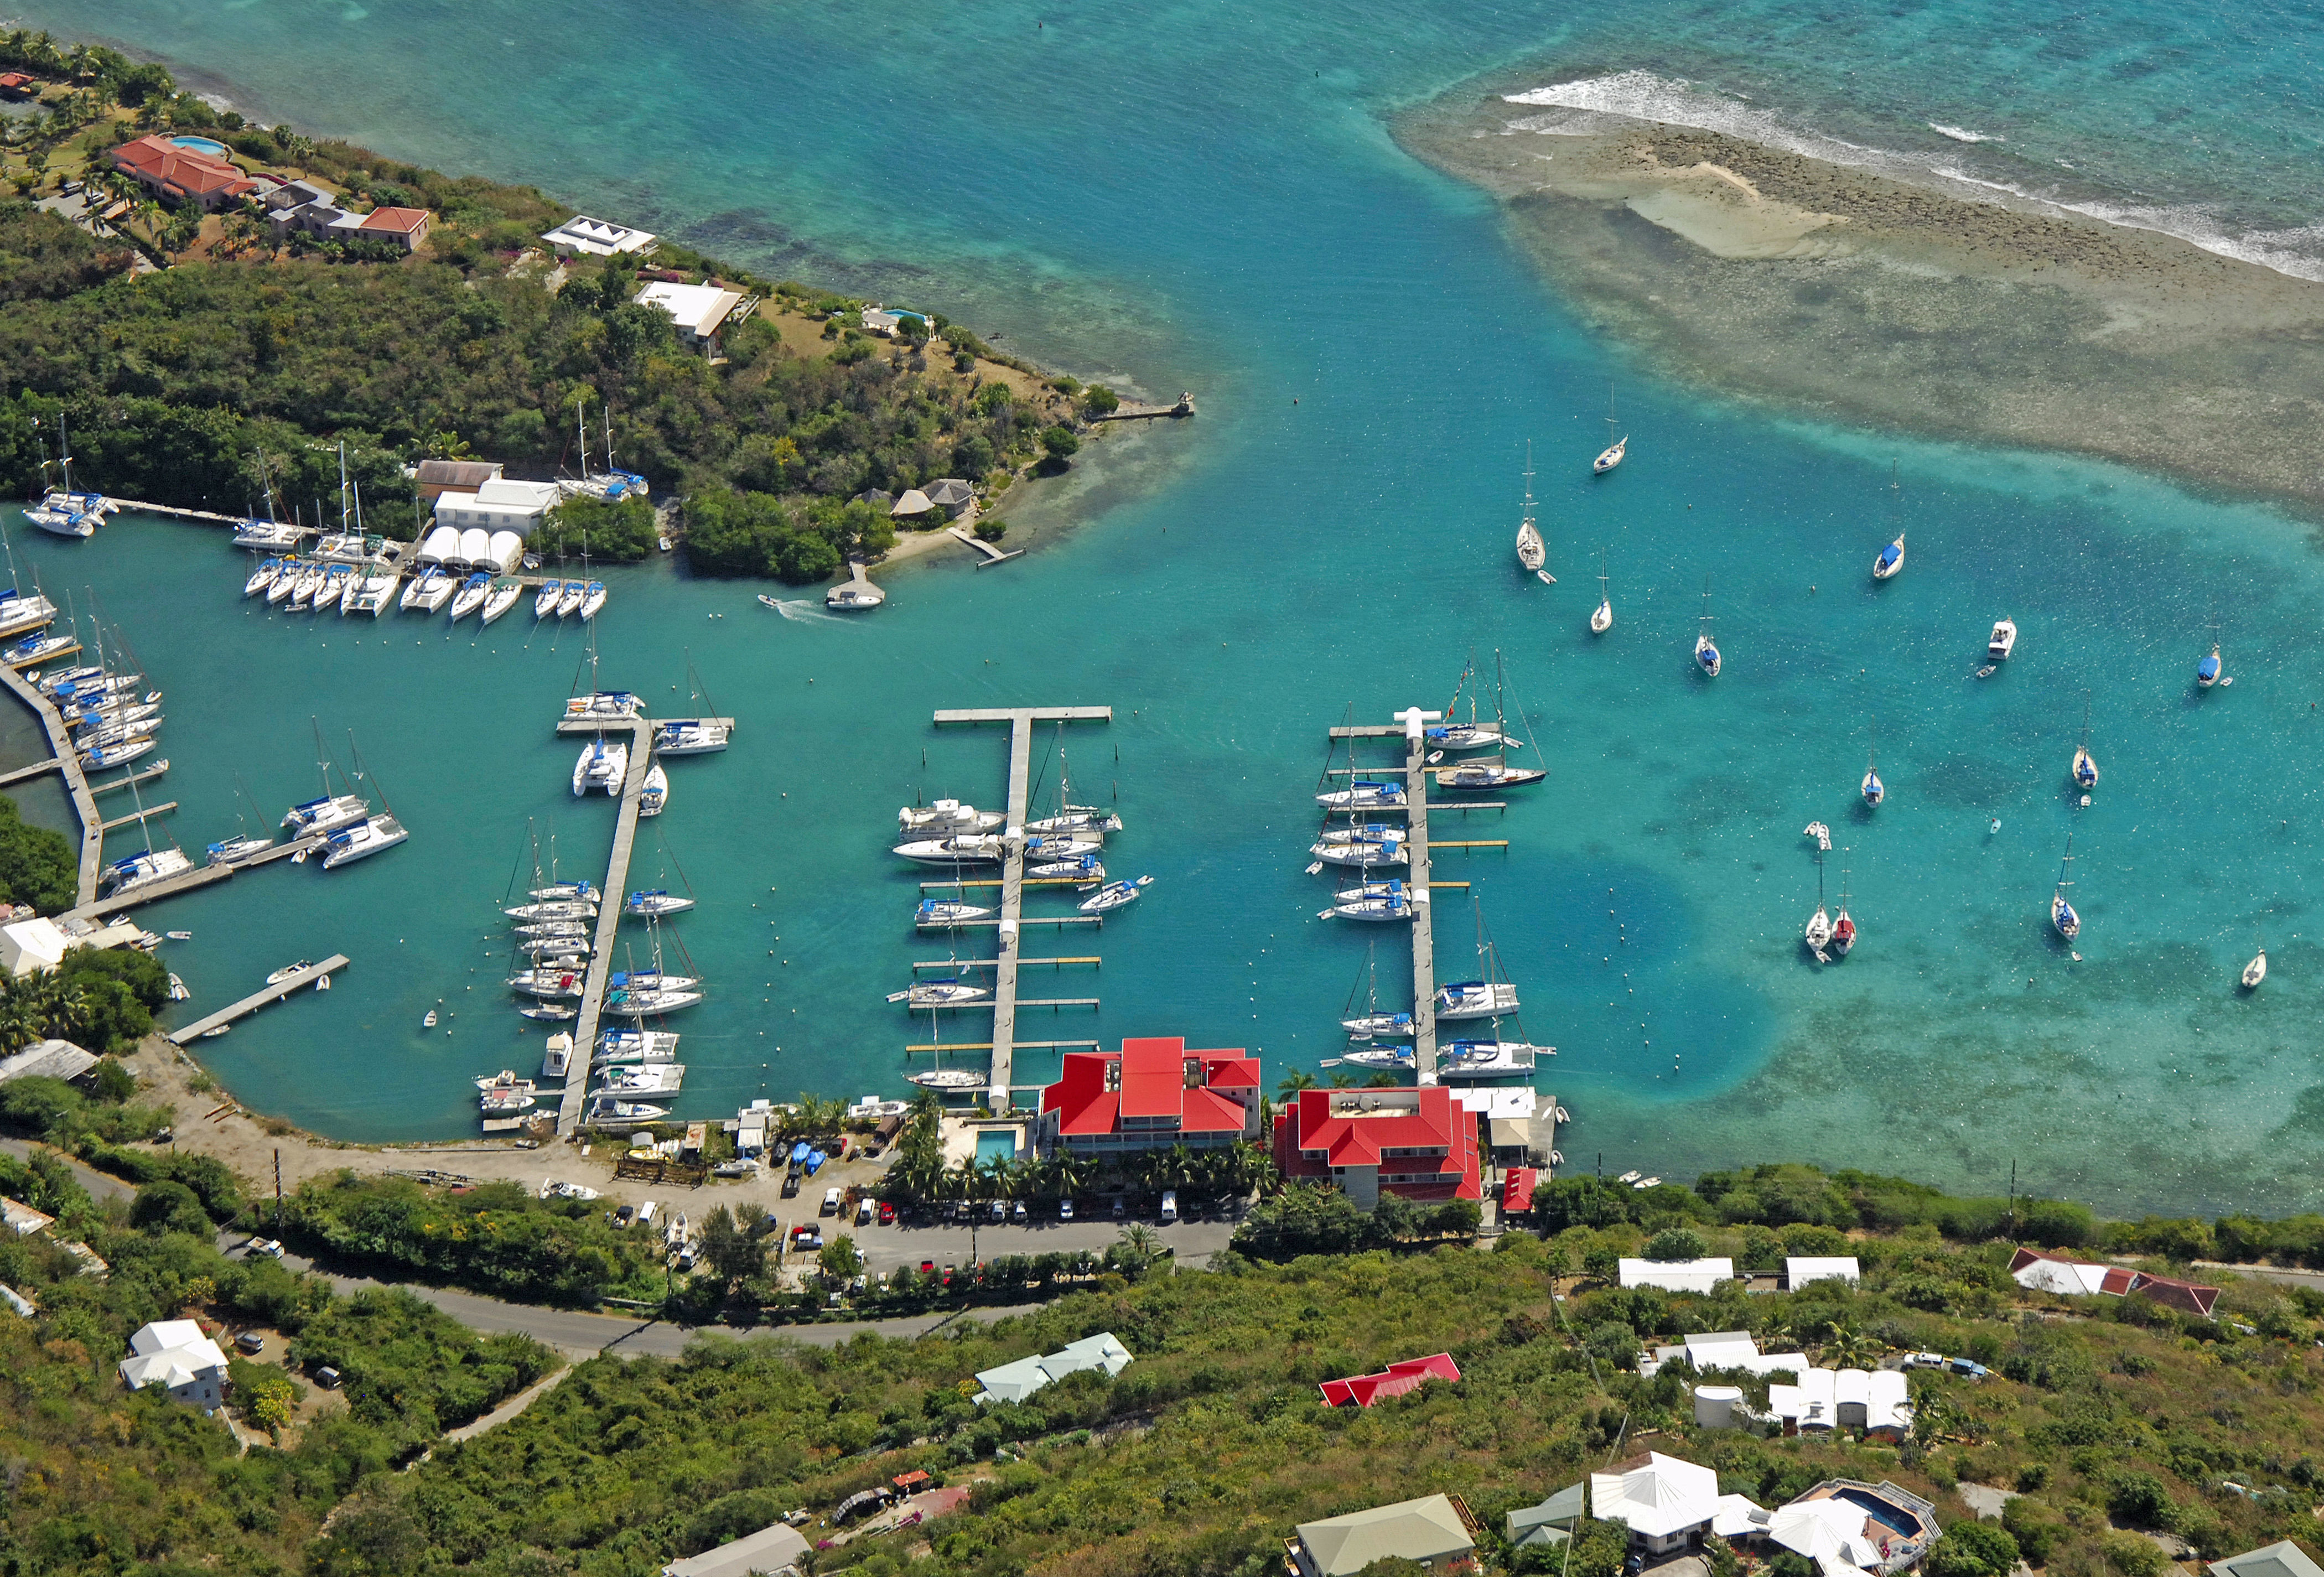 Hodge's Creek Marina in Maya Cove, Tortola, British Virgin